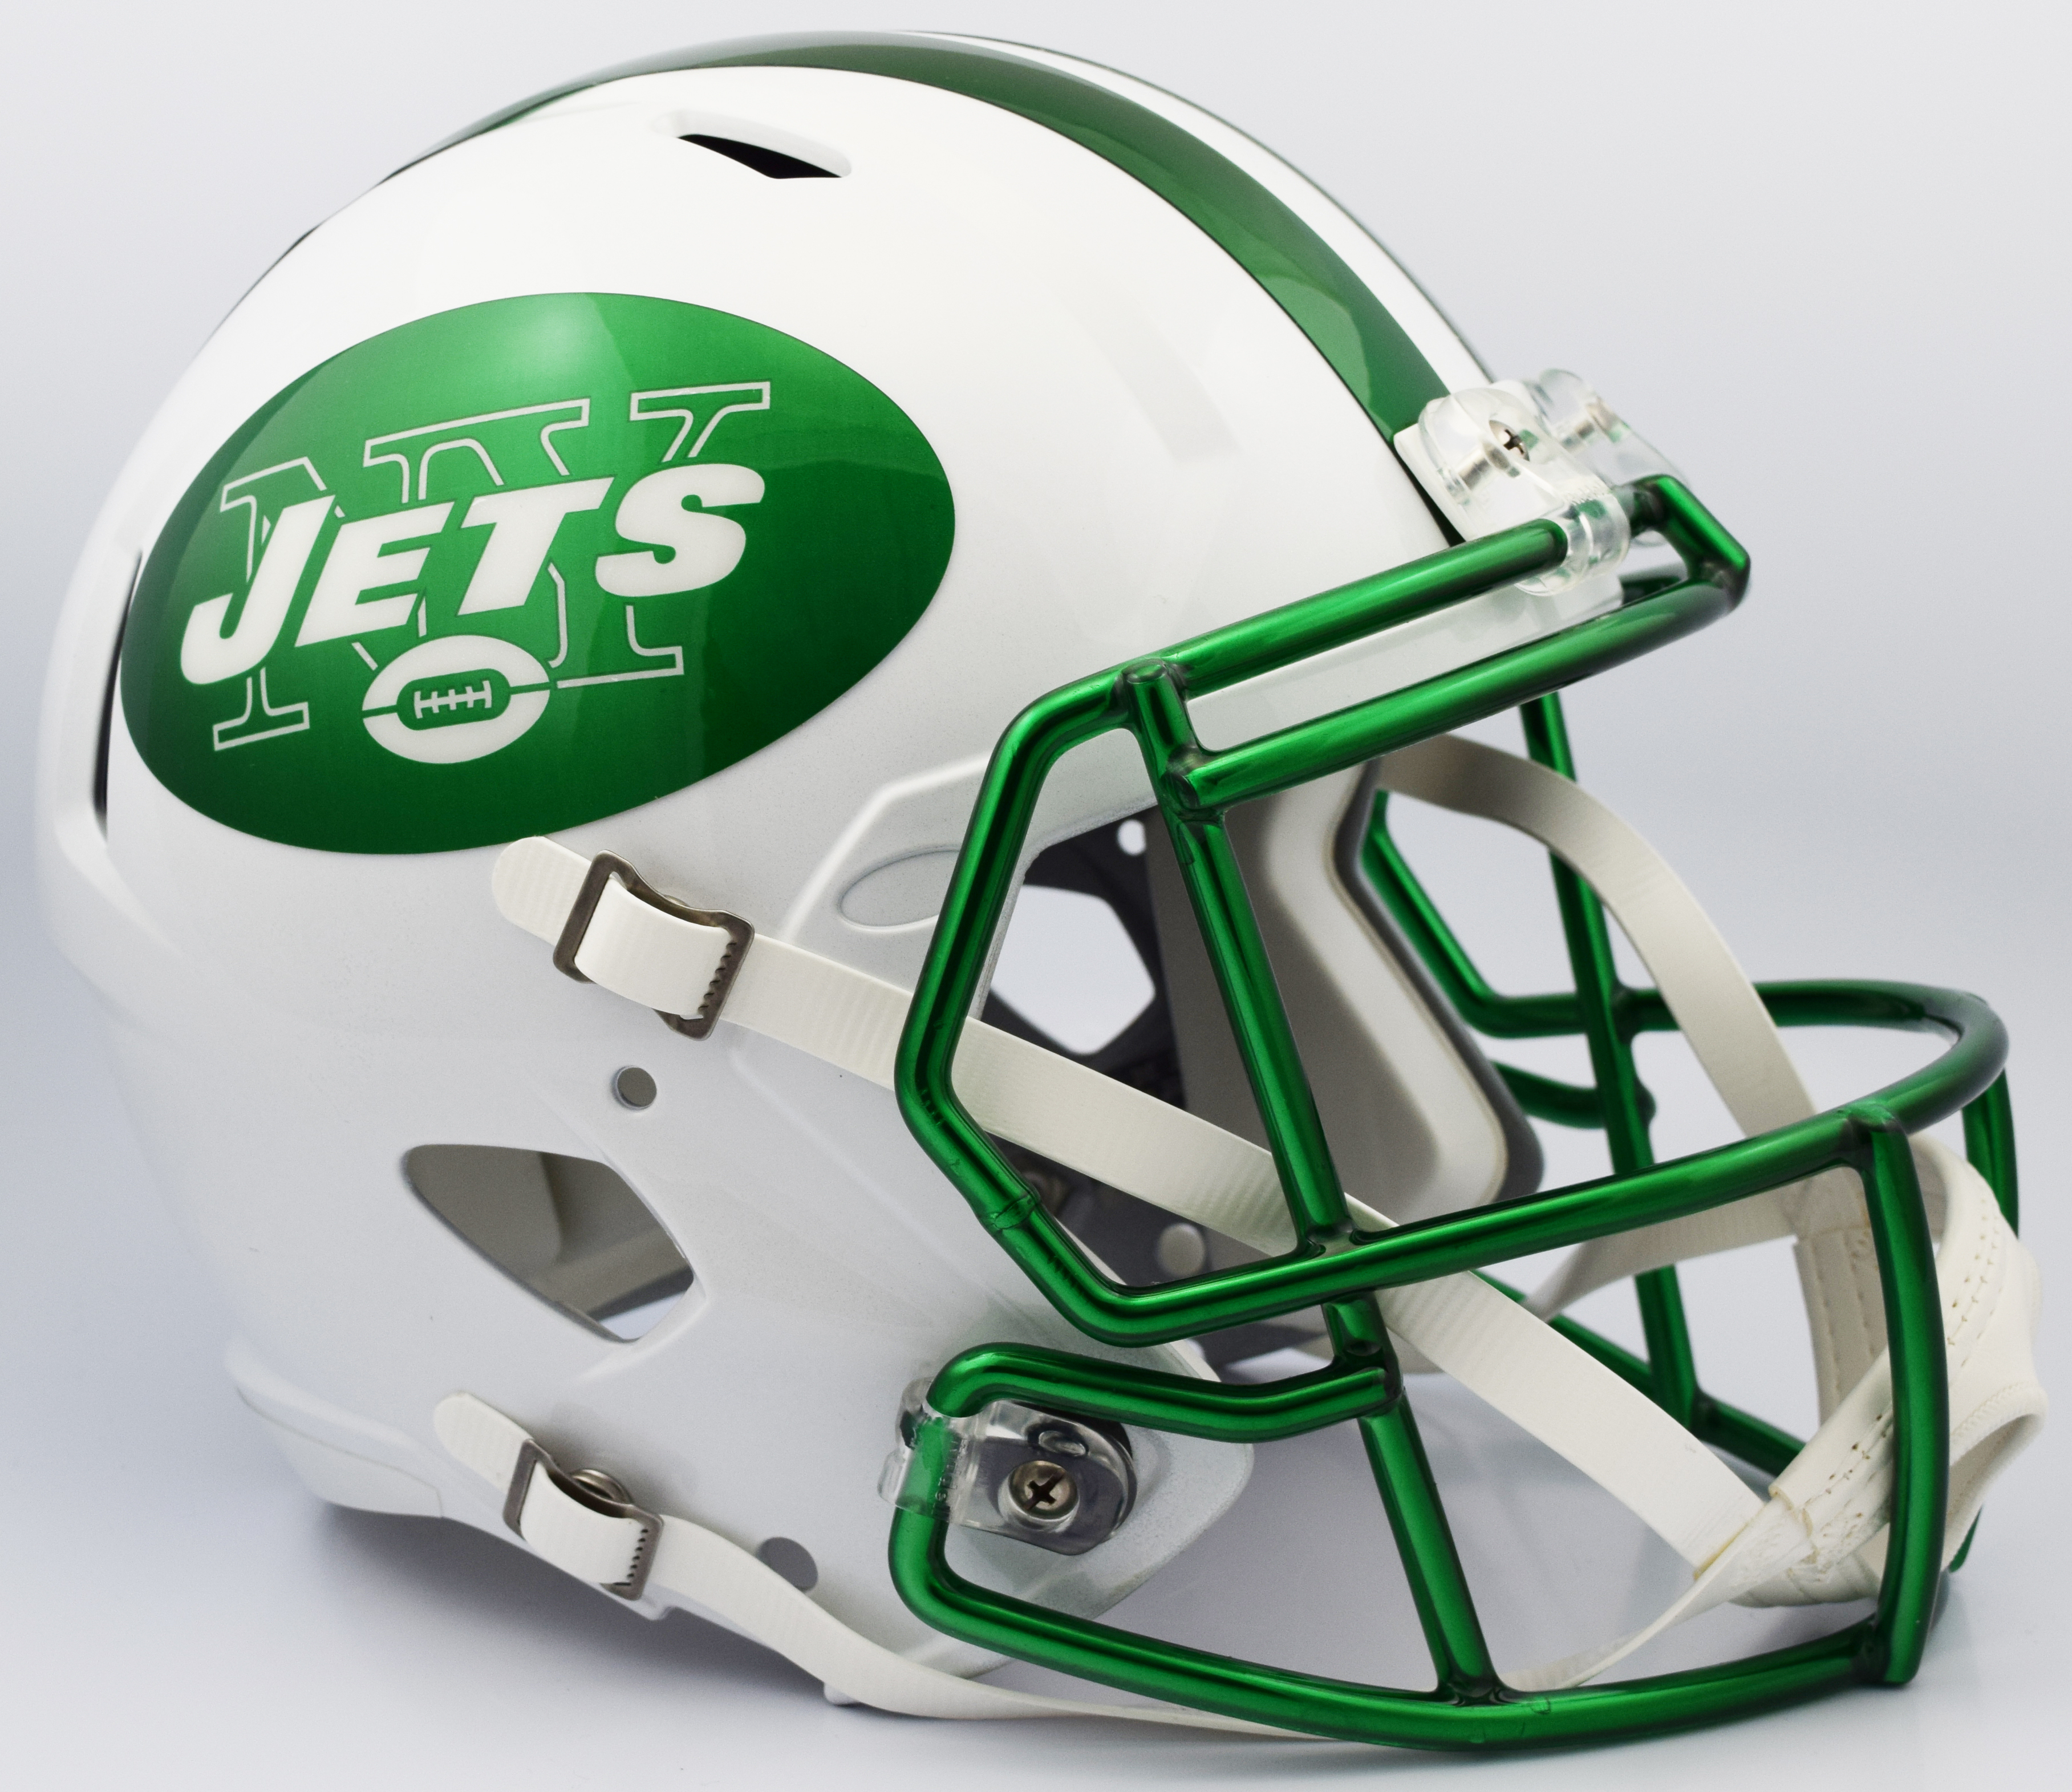 New York Jets Speed Replica Football Helmet <B>2018 Chrome Green Mask</B>